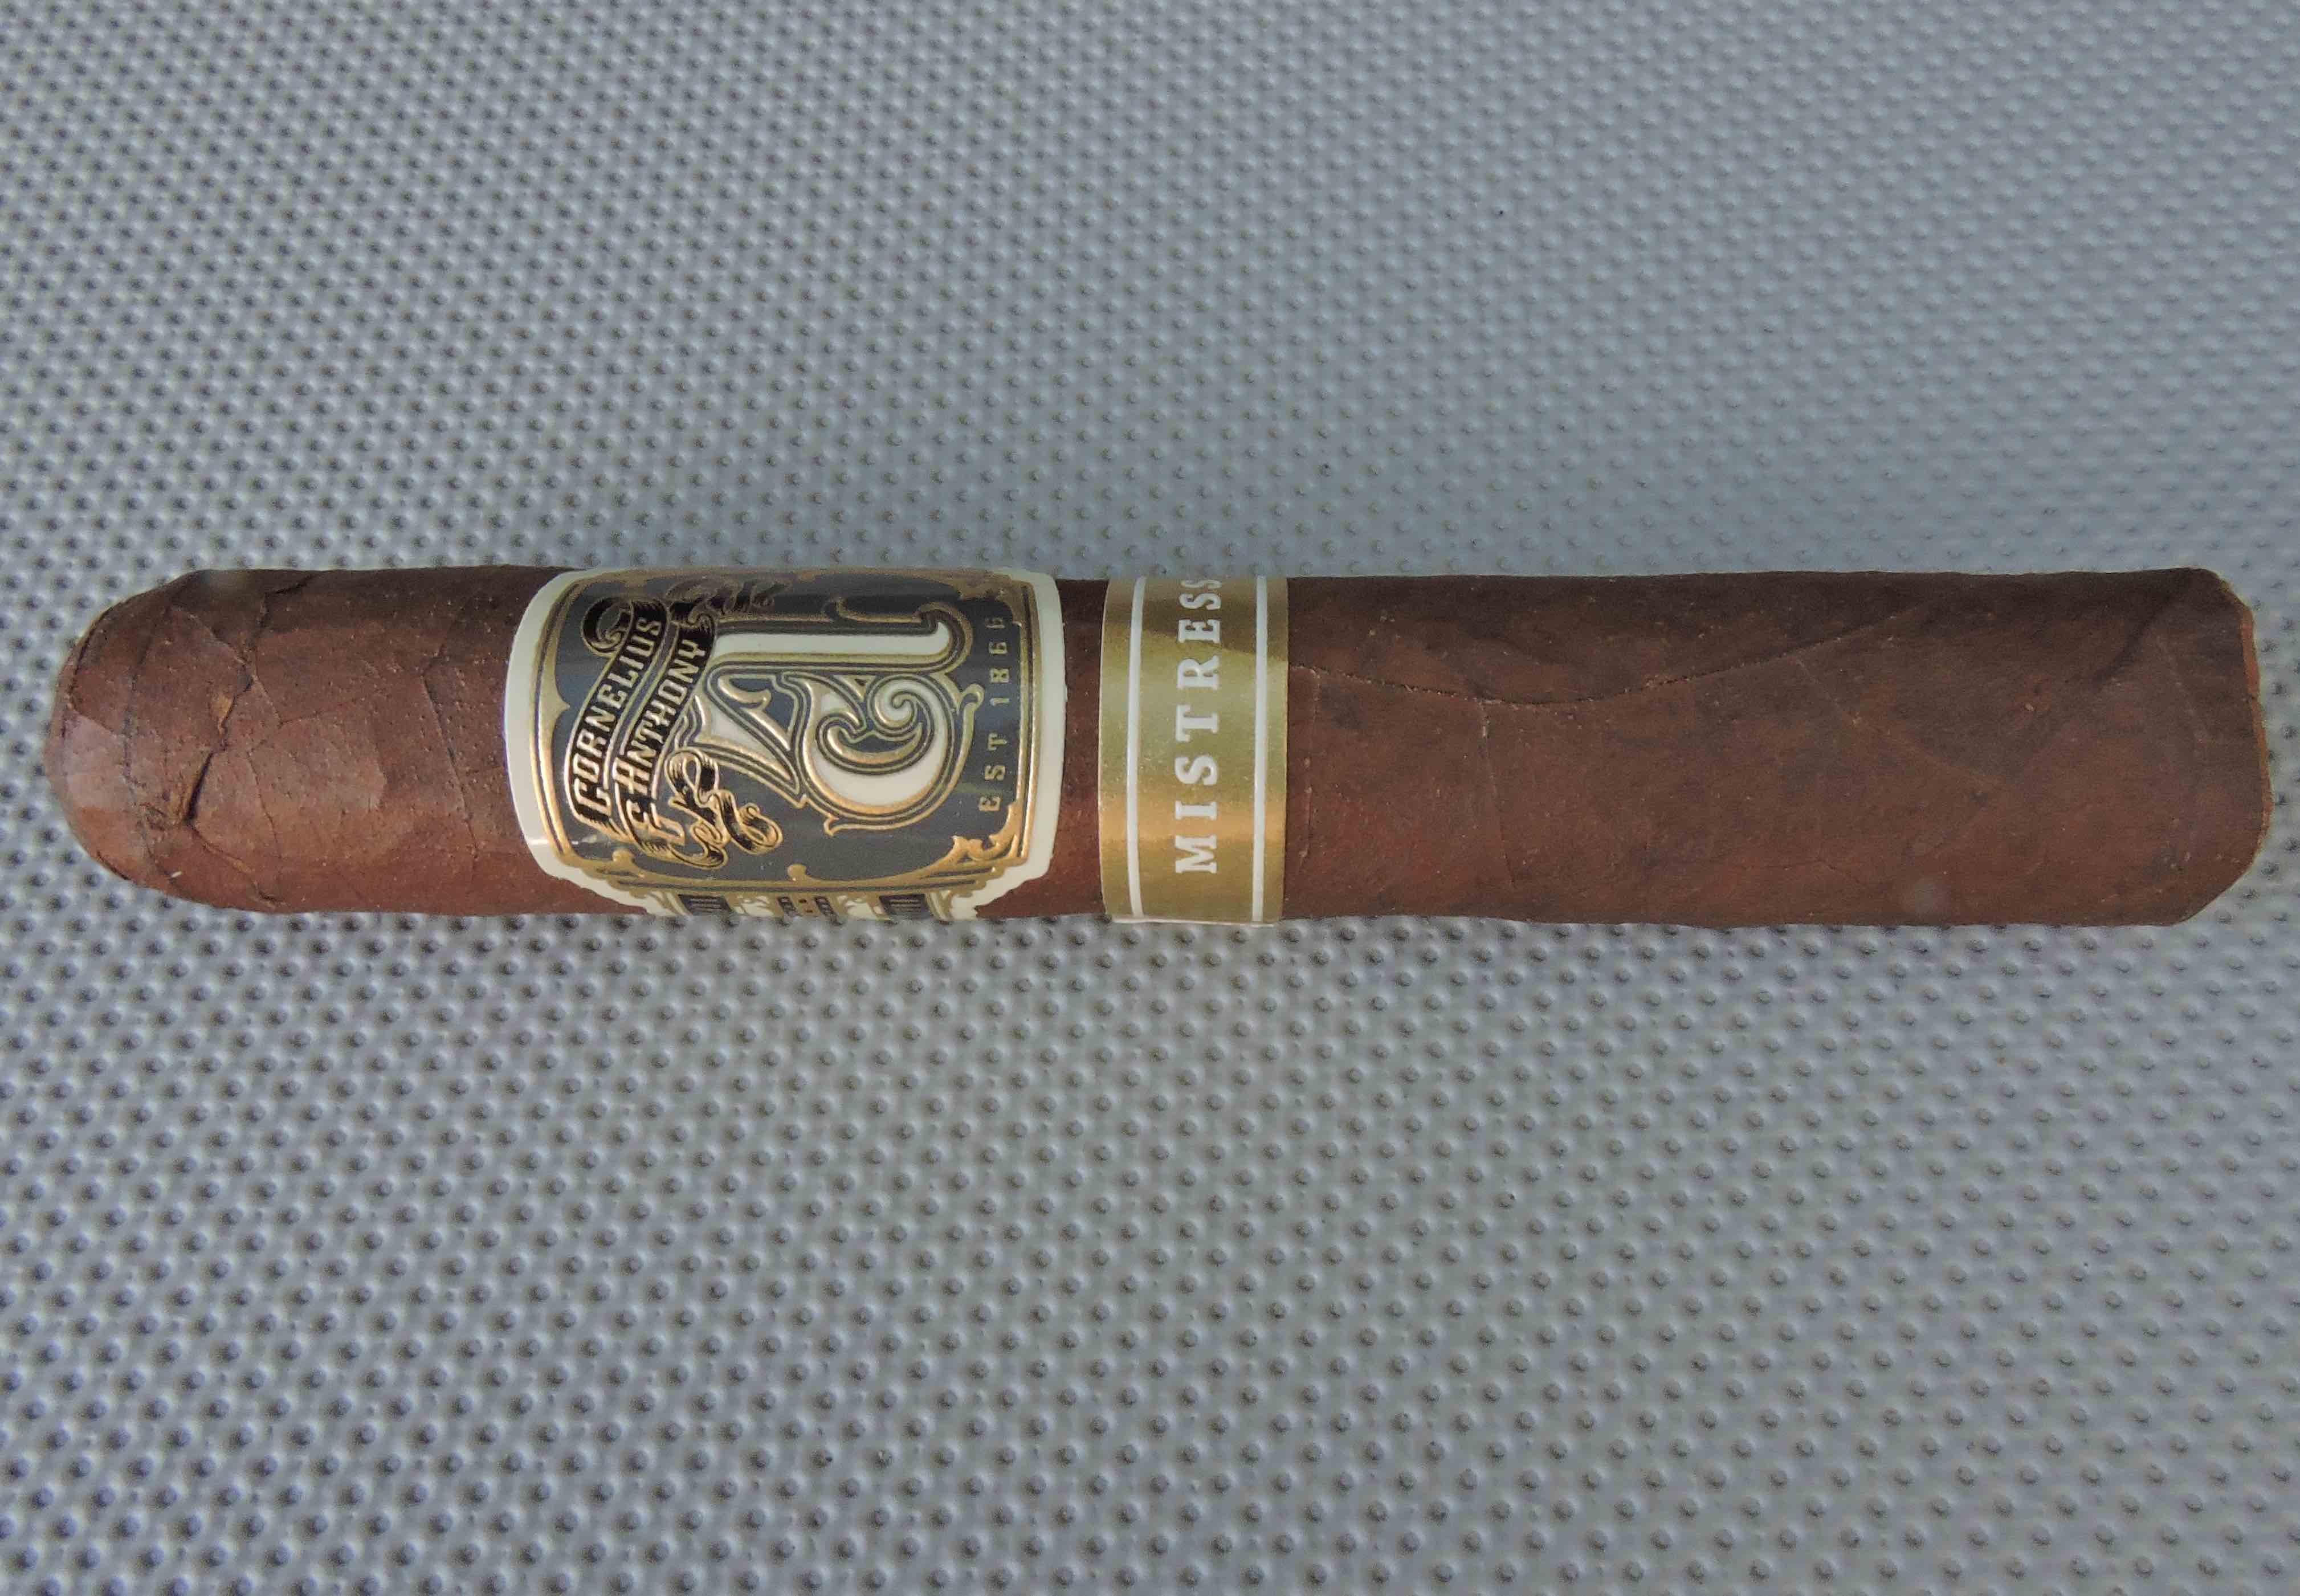 Cigar Review: Cornelius & Anthony – The Mistress Robusto